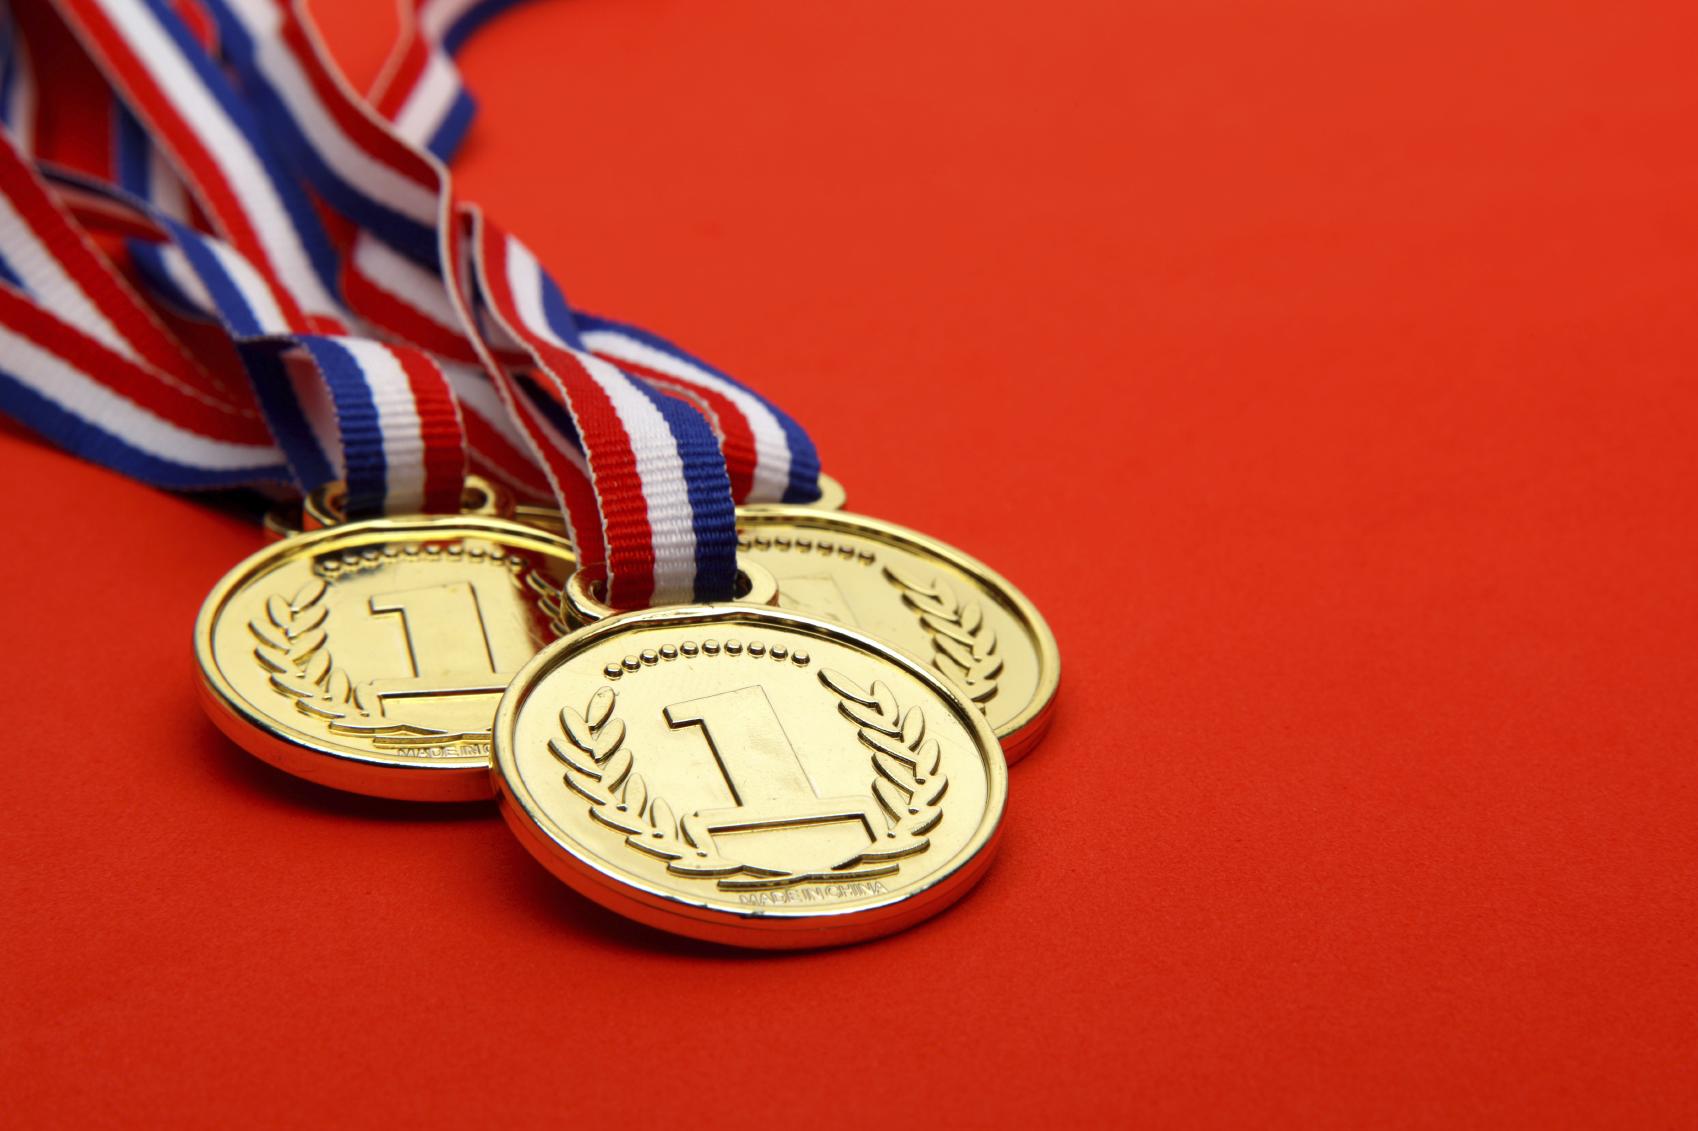 CAMPIONATE EUROPENE,MEDALIE DE AUR,INOT,MAXBET,CAZINO,JOCURILE OLIMPICE,TOKYO,BUDAPESTA,ARGINT,NATAȚIE,ROMANIA